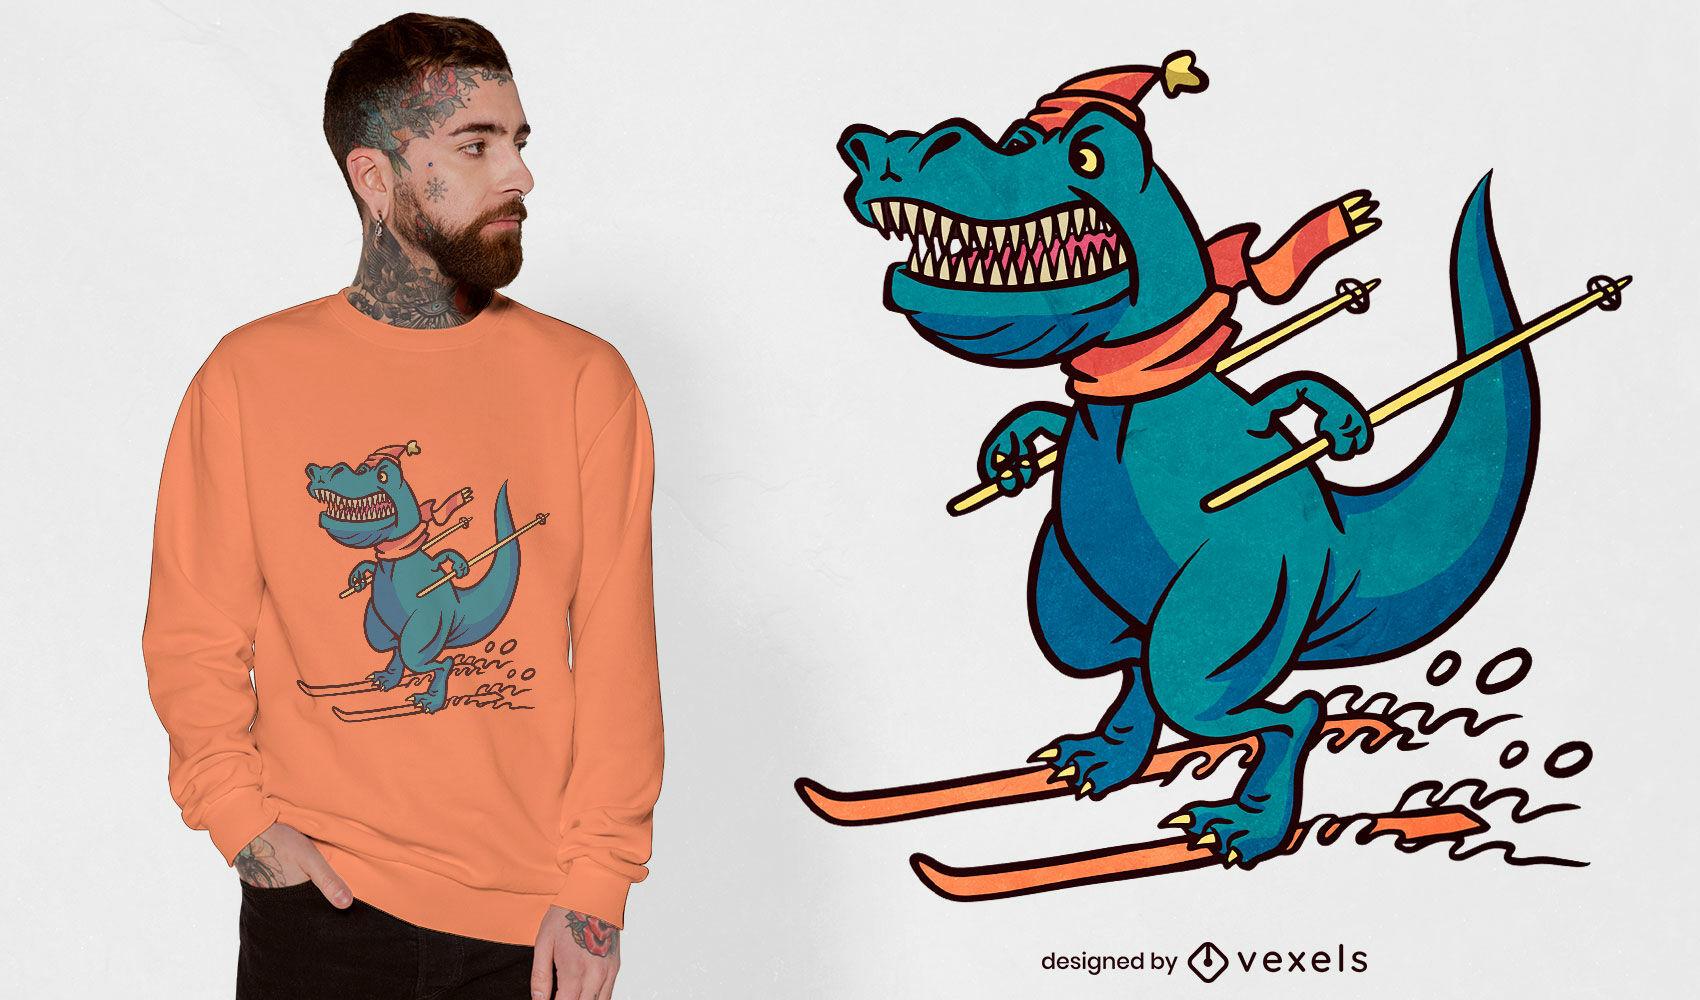 Diseño de camiseta de dinosaurio de esquí.